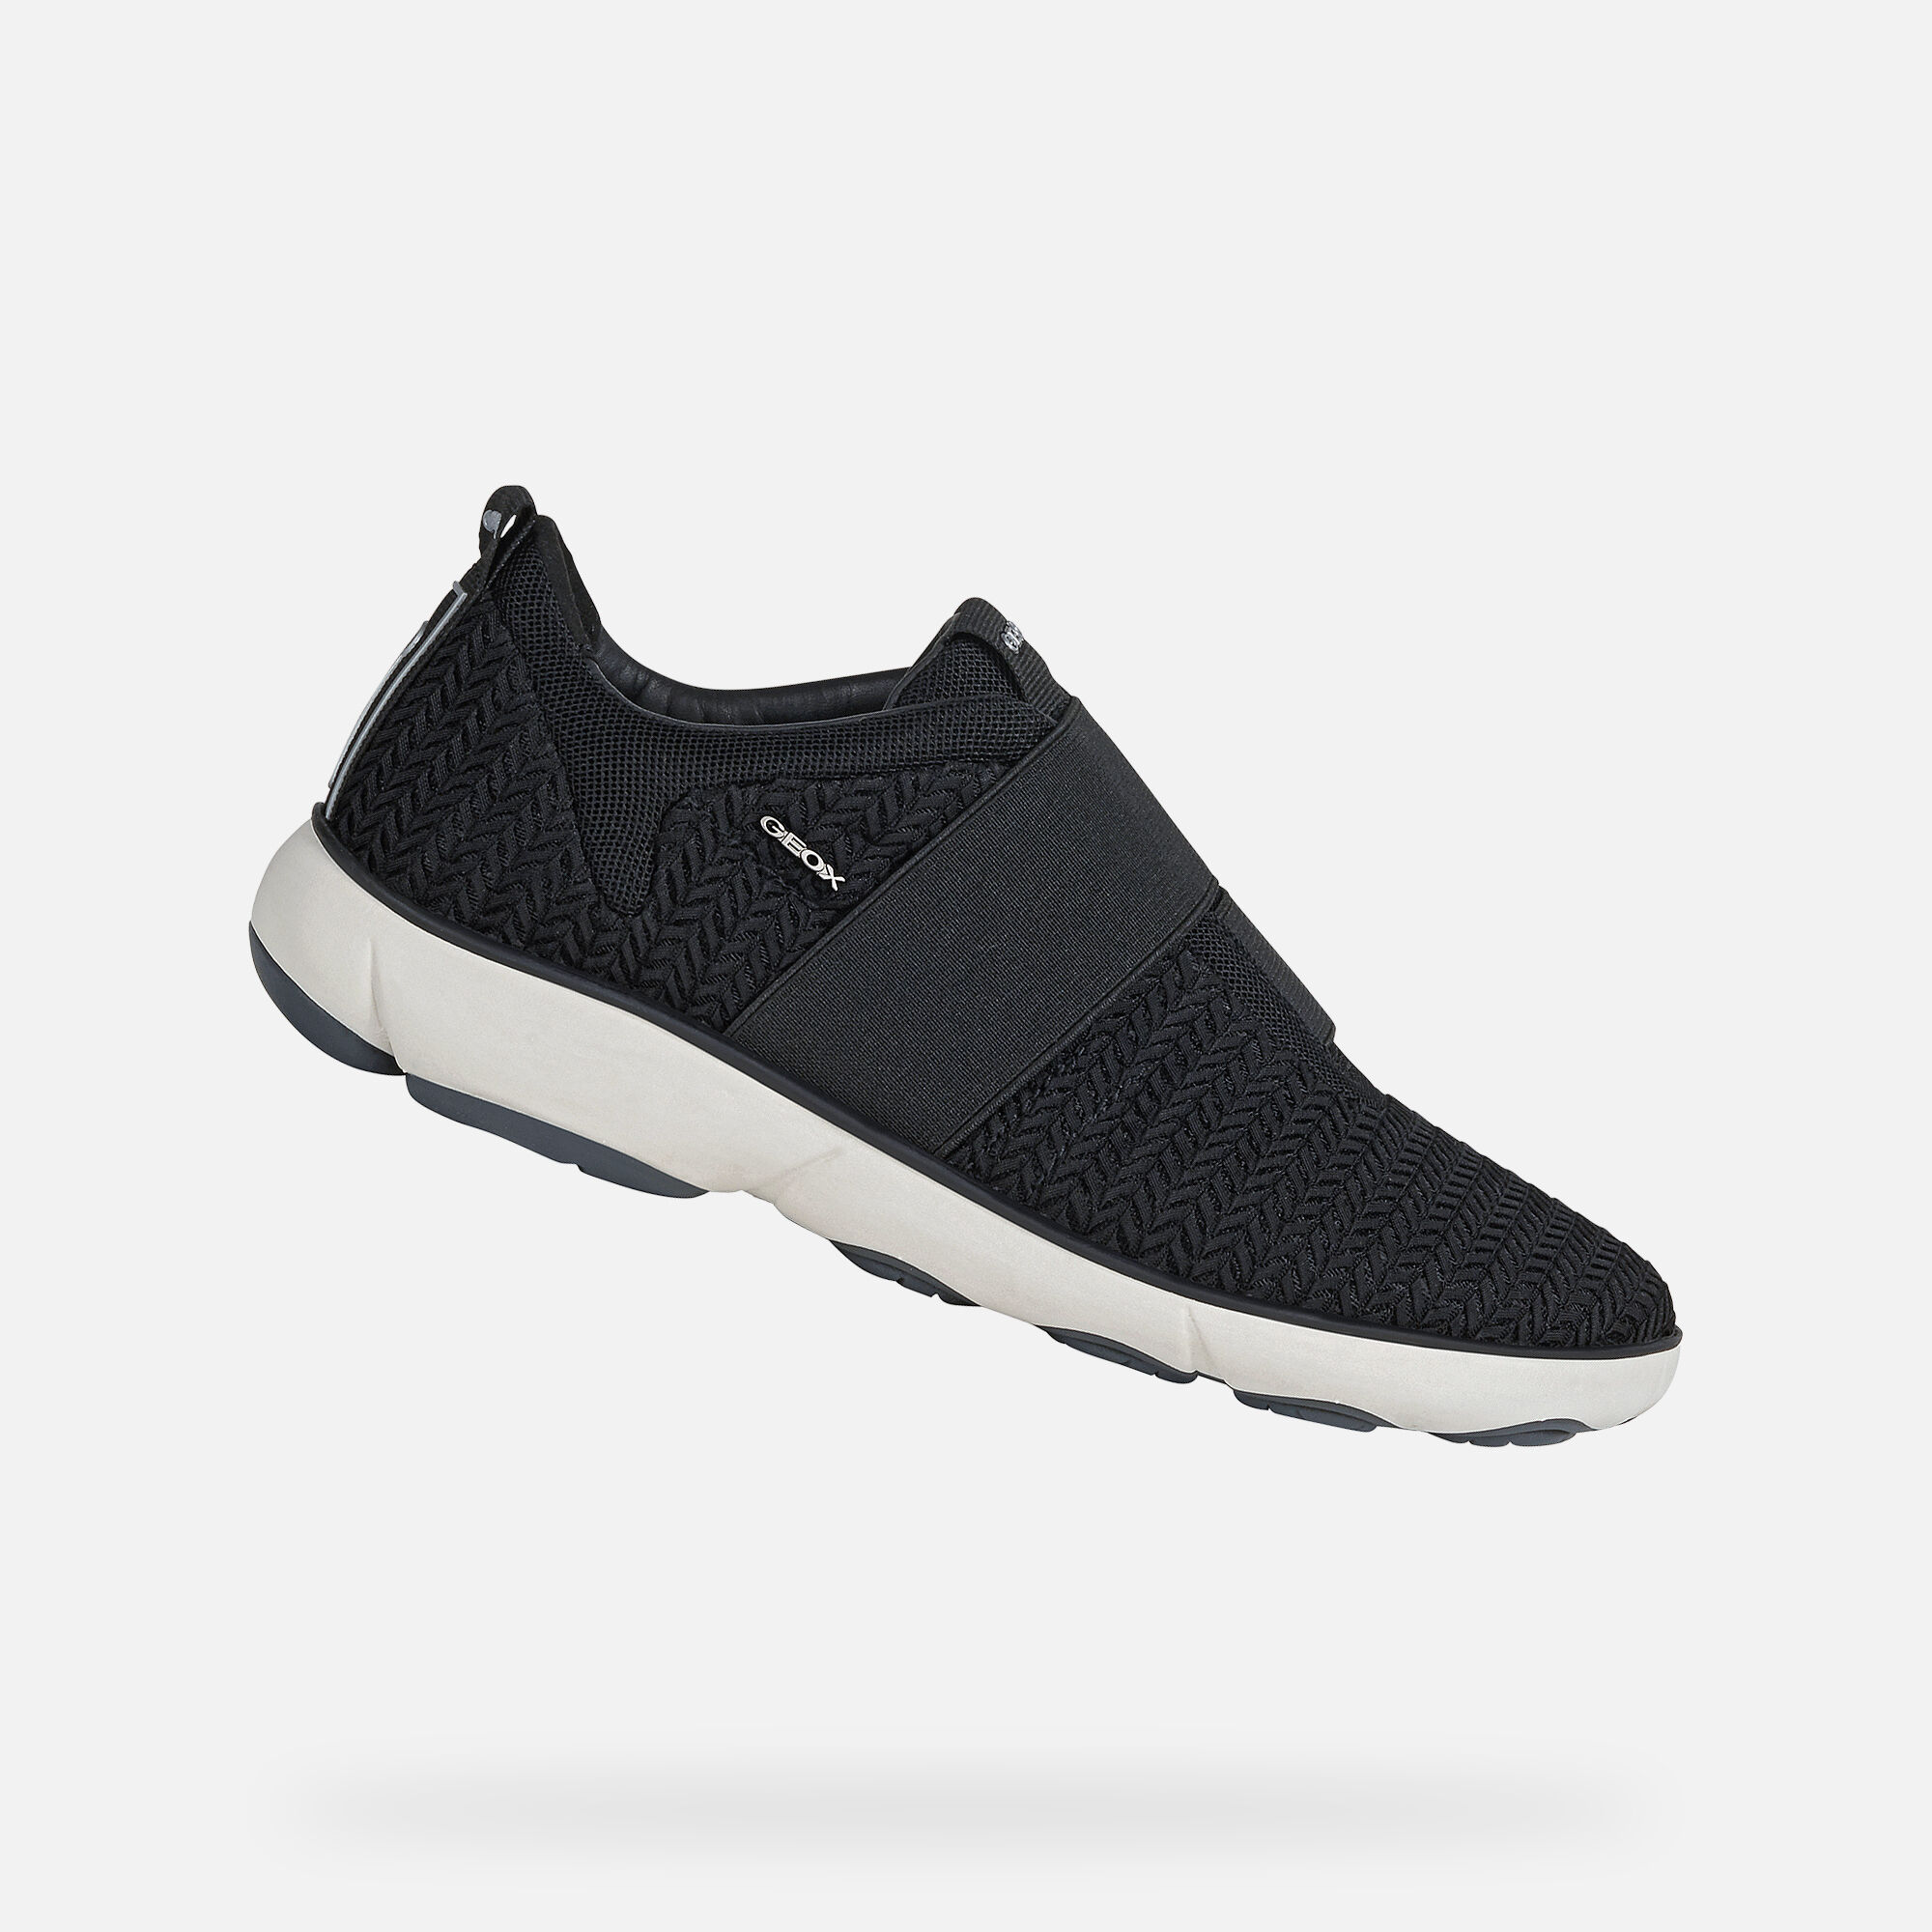 mizuno mens running shoes size 11 youtube tall place zaragoza